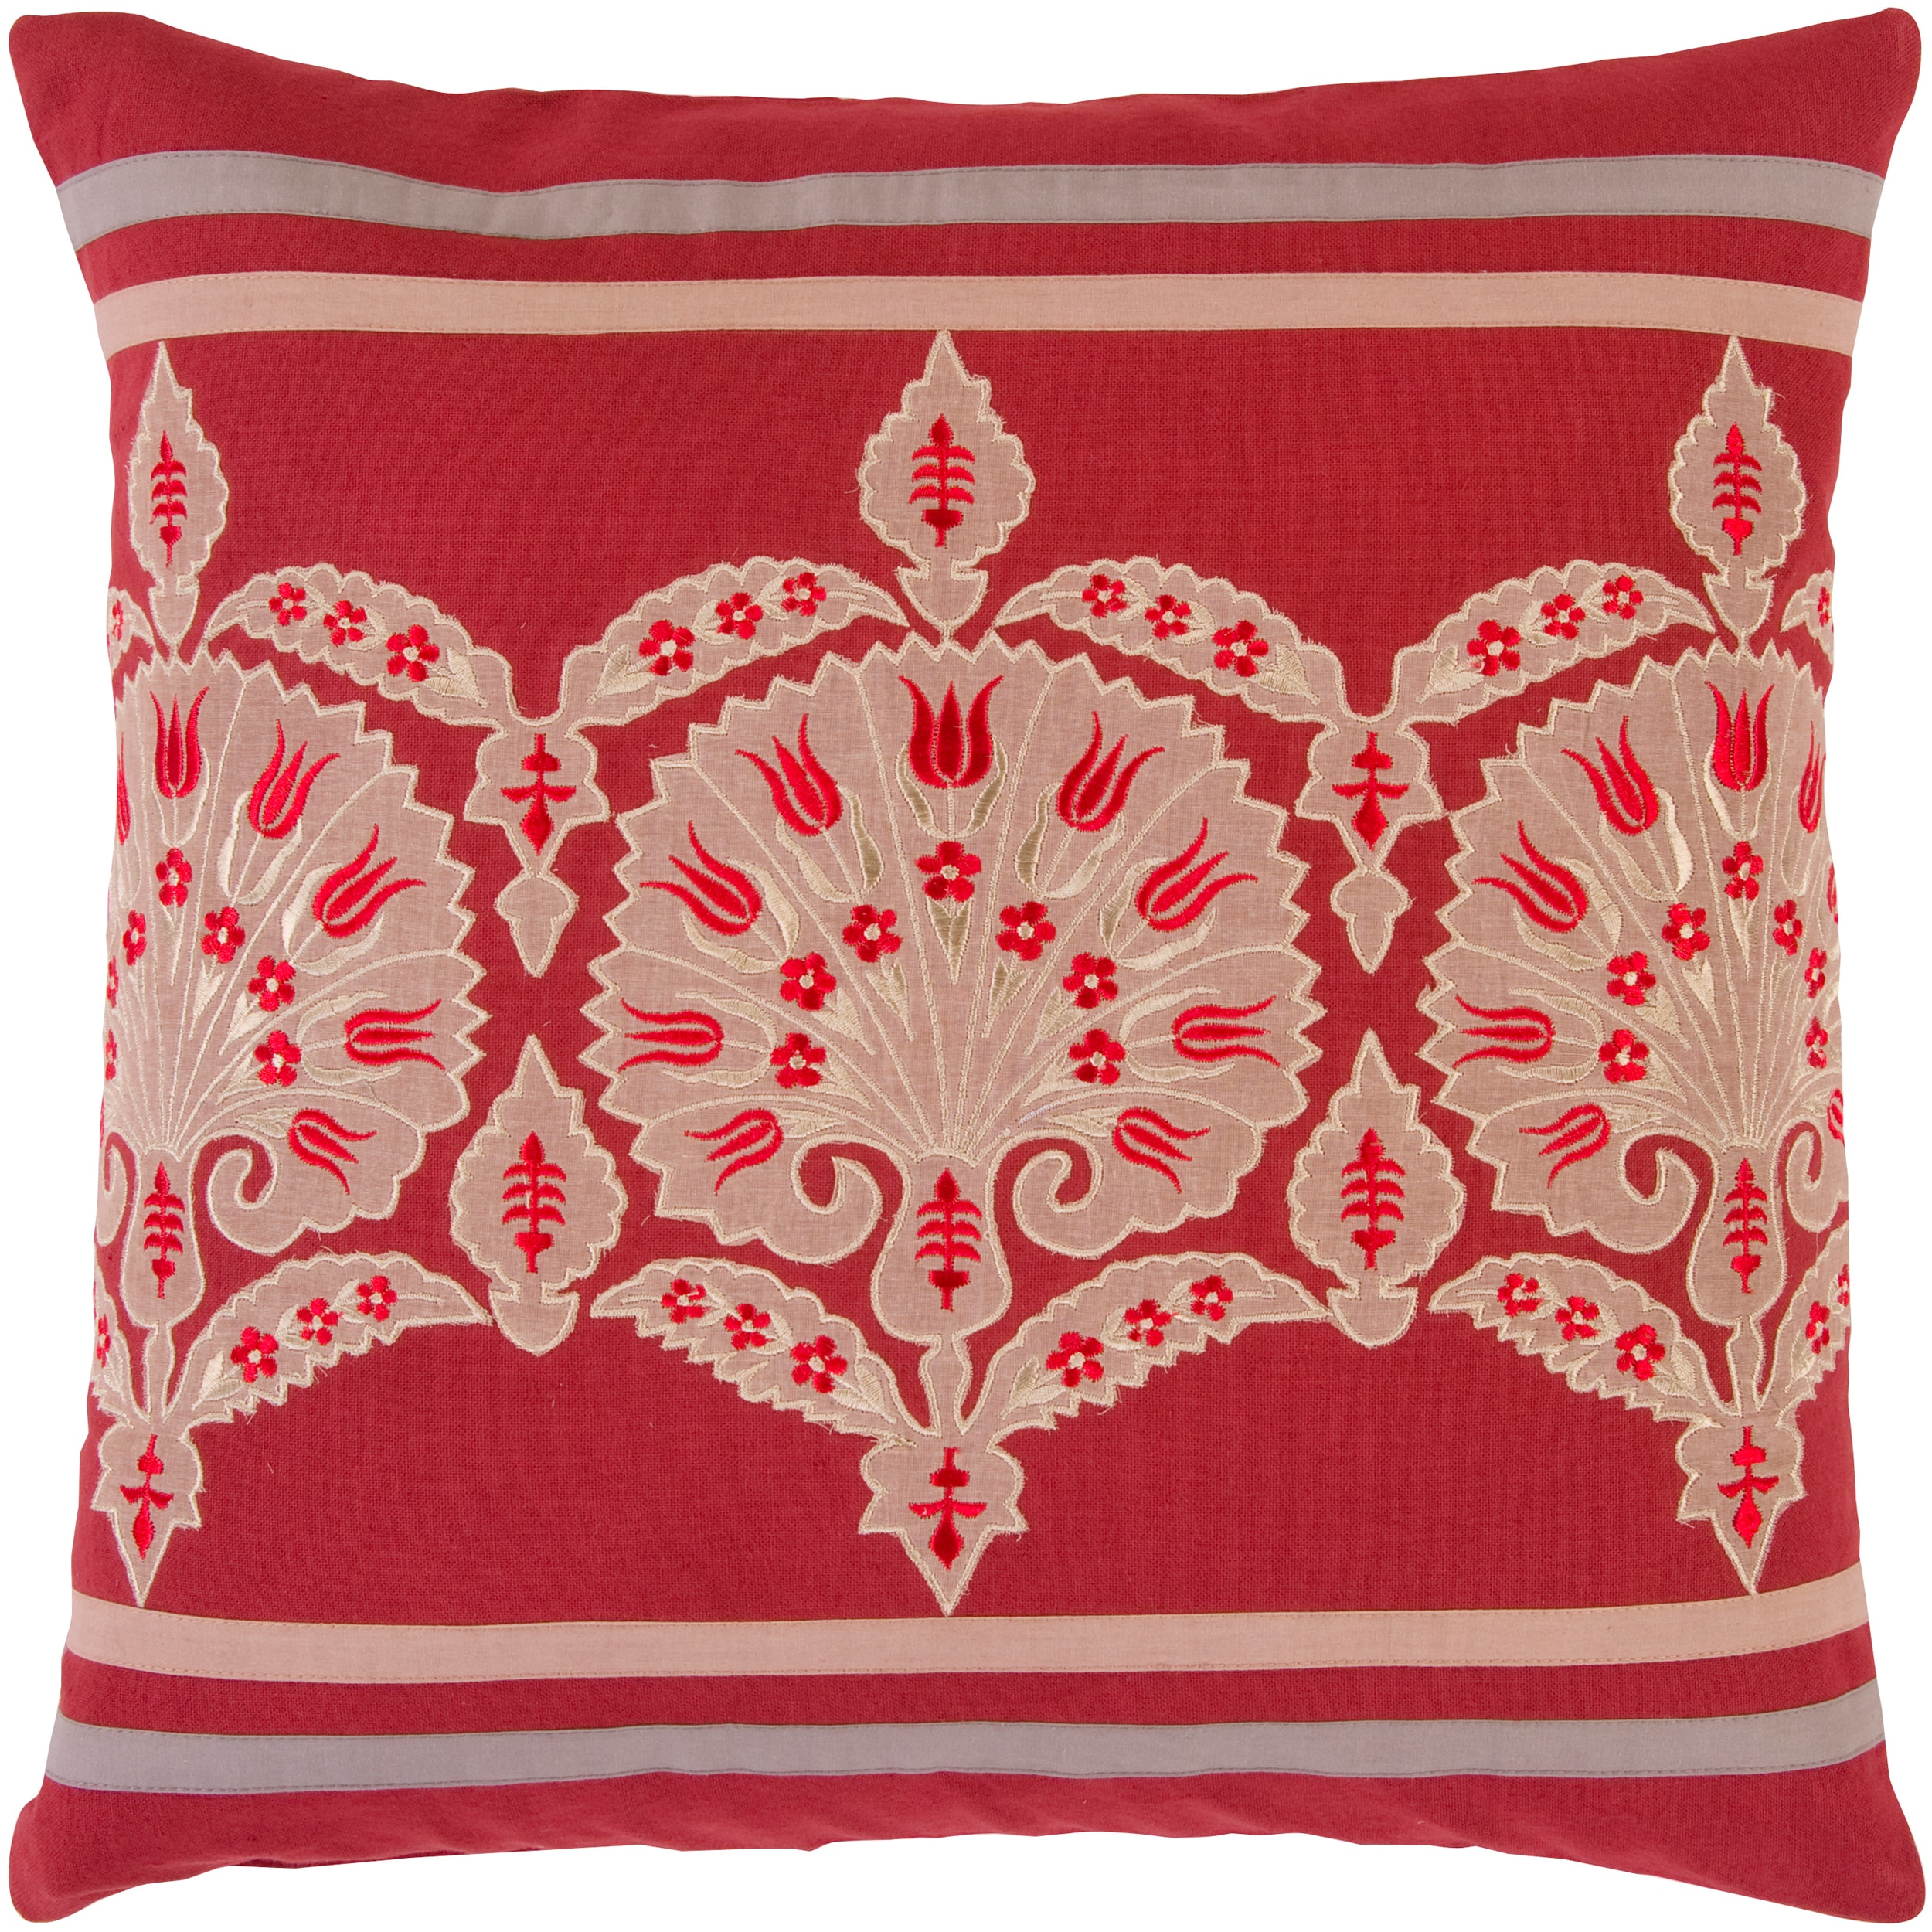 Decorative Berlin Pillow